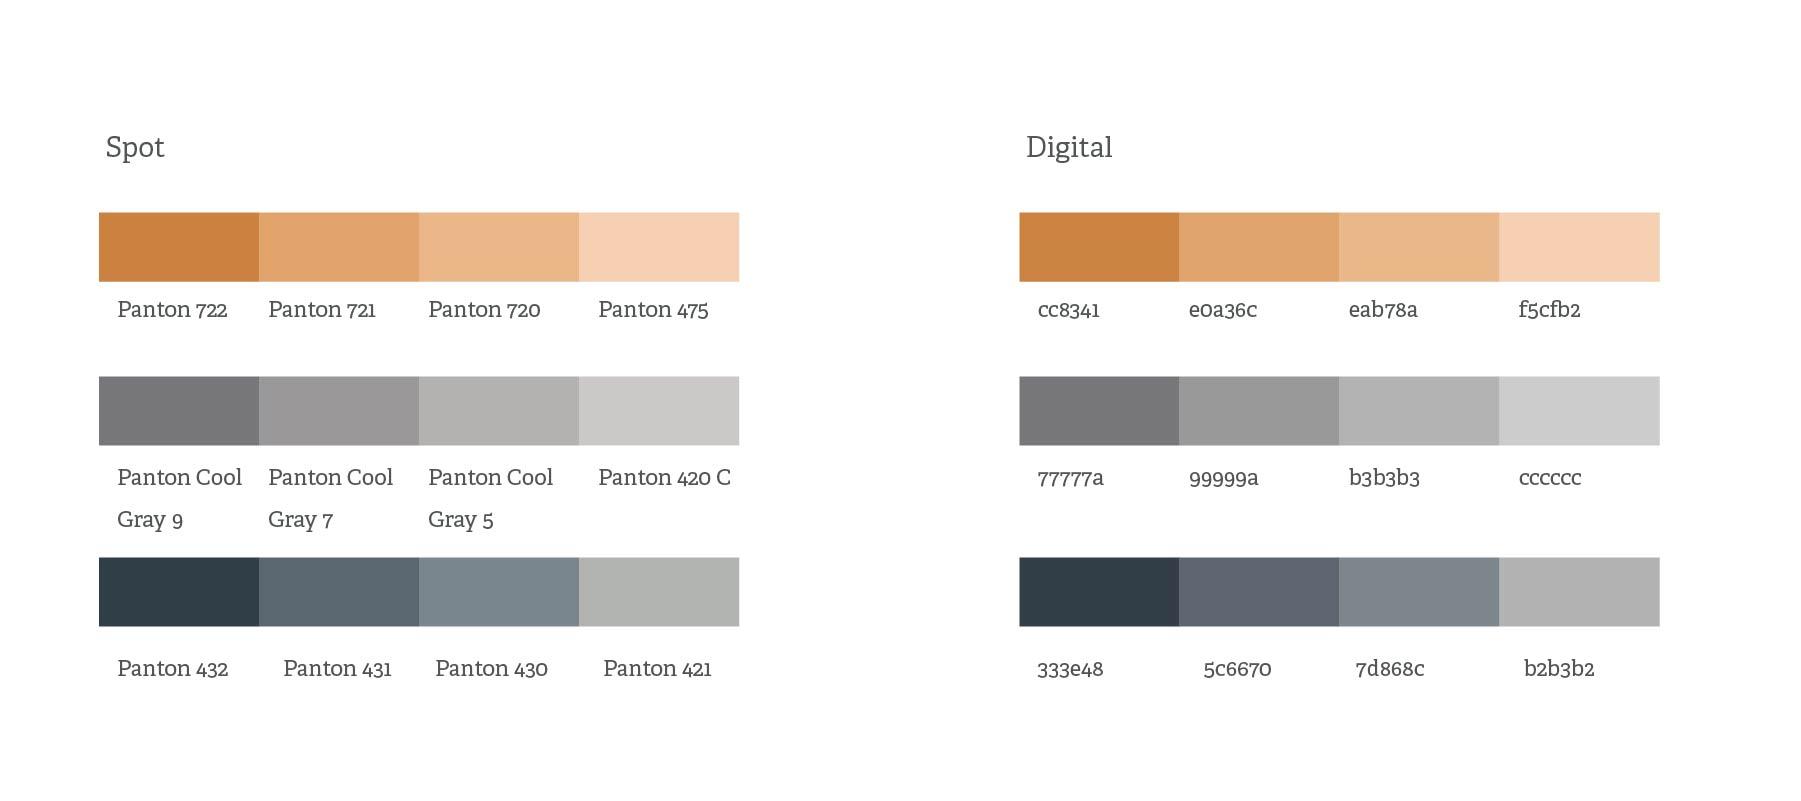 colors Asperitas cloud sercurity storage consulting brand logo stationary graphic design.jpg